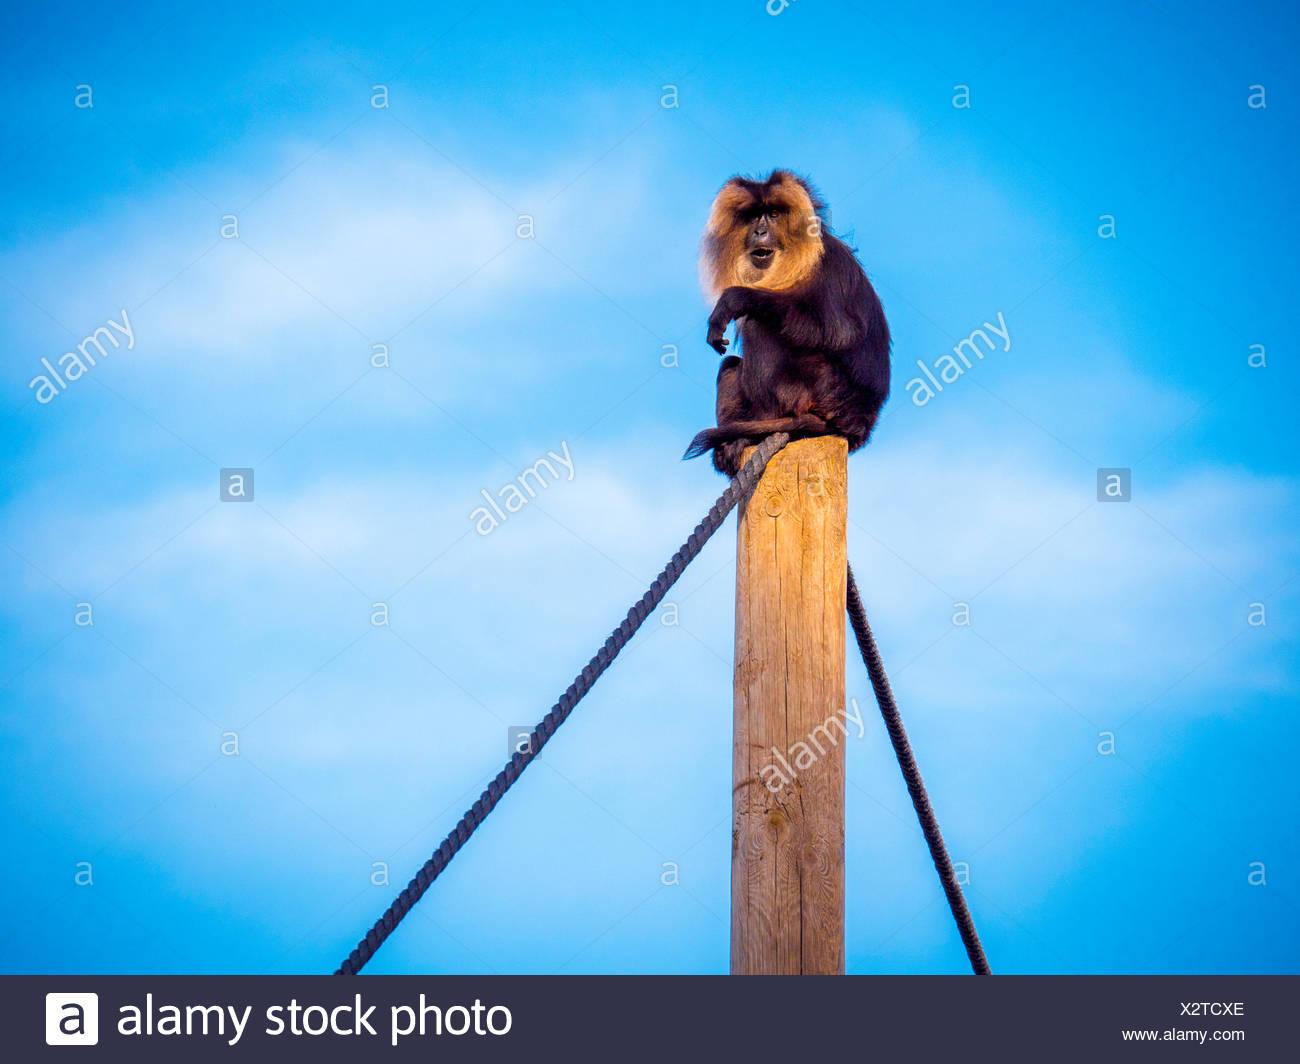 Monkey Sitting On Wooden Post - Stock Image